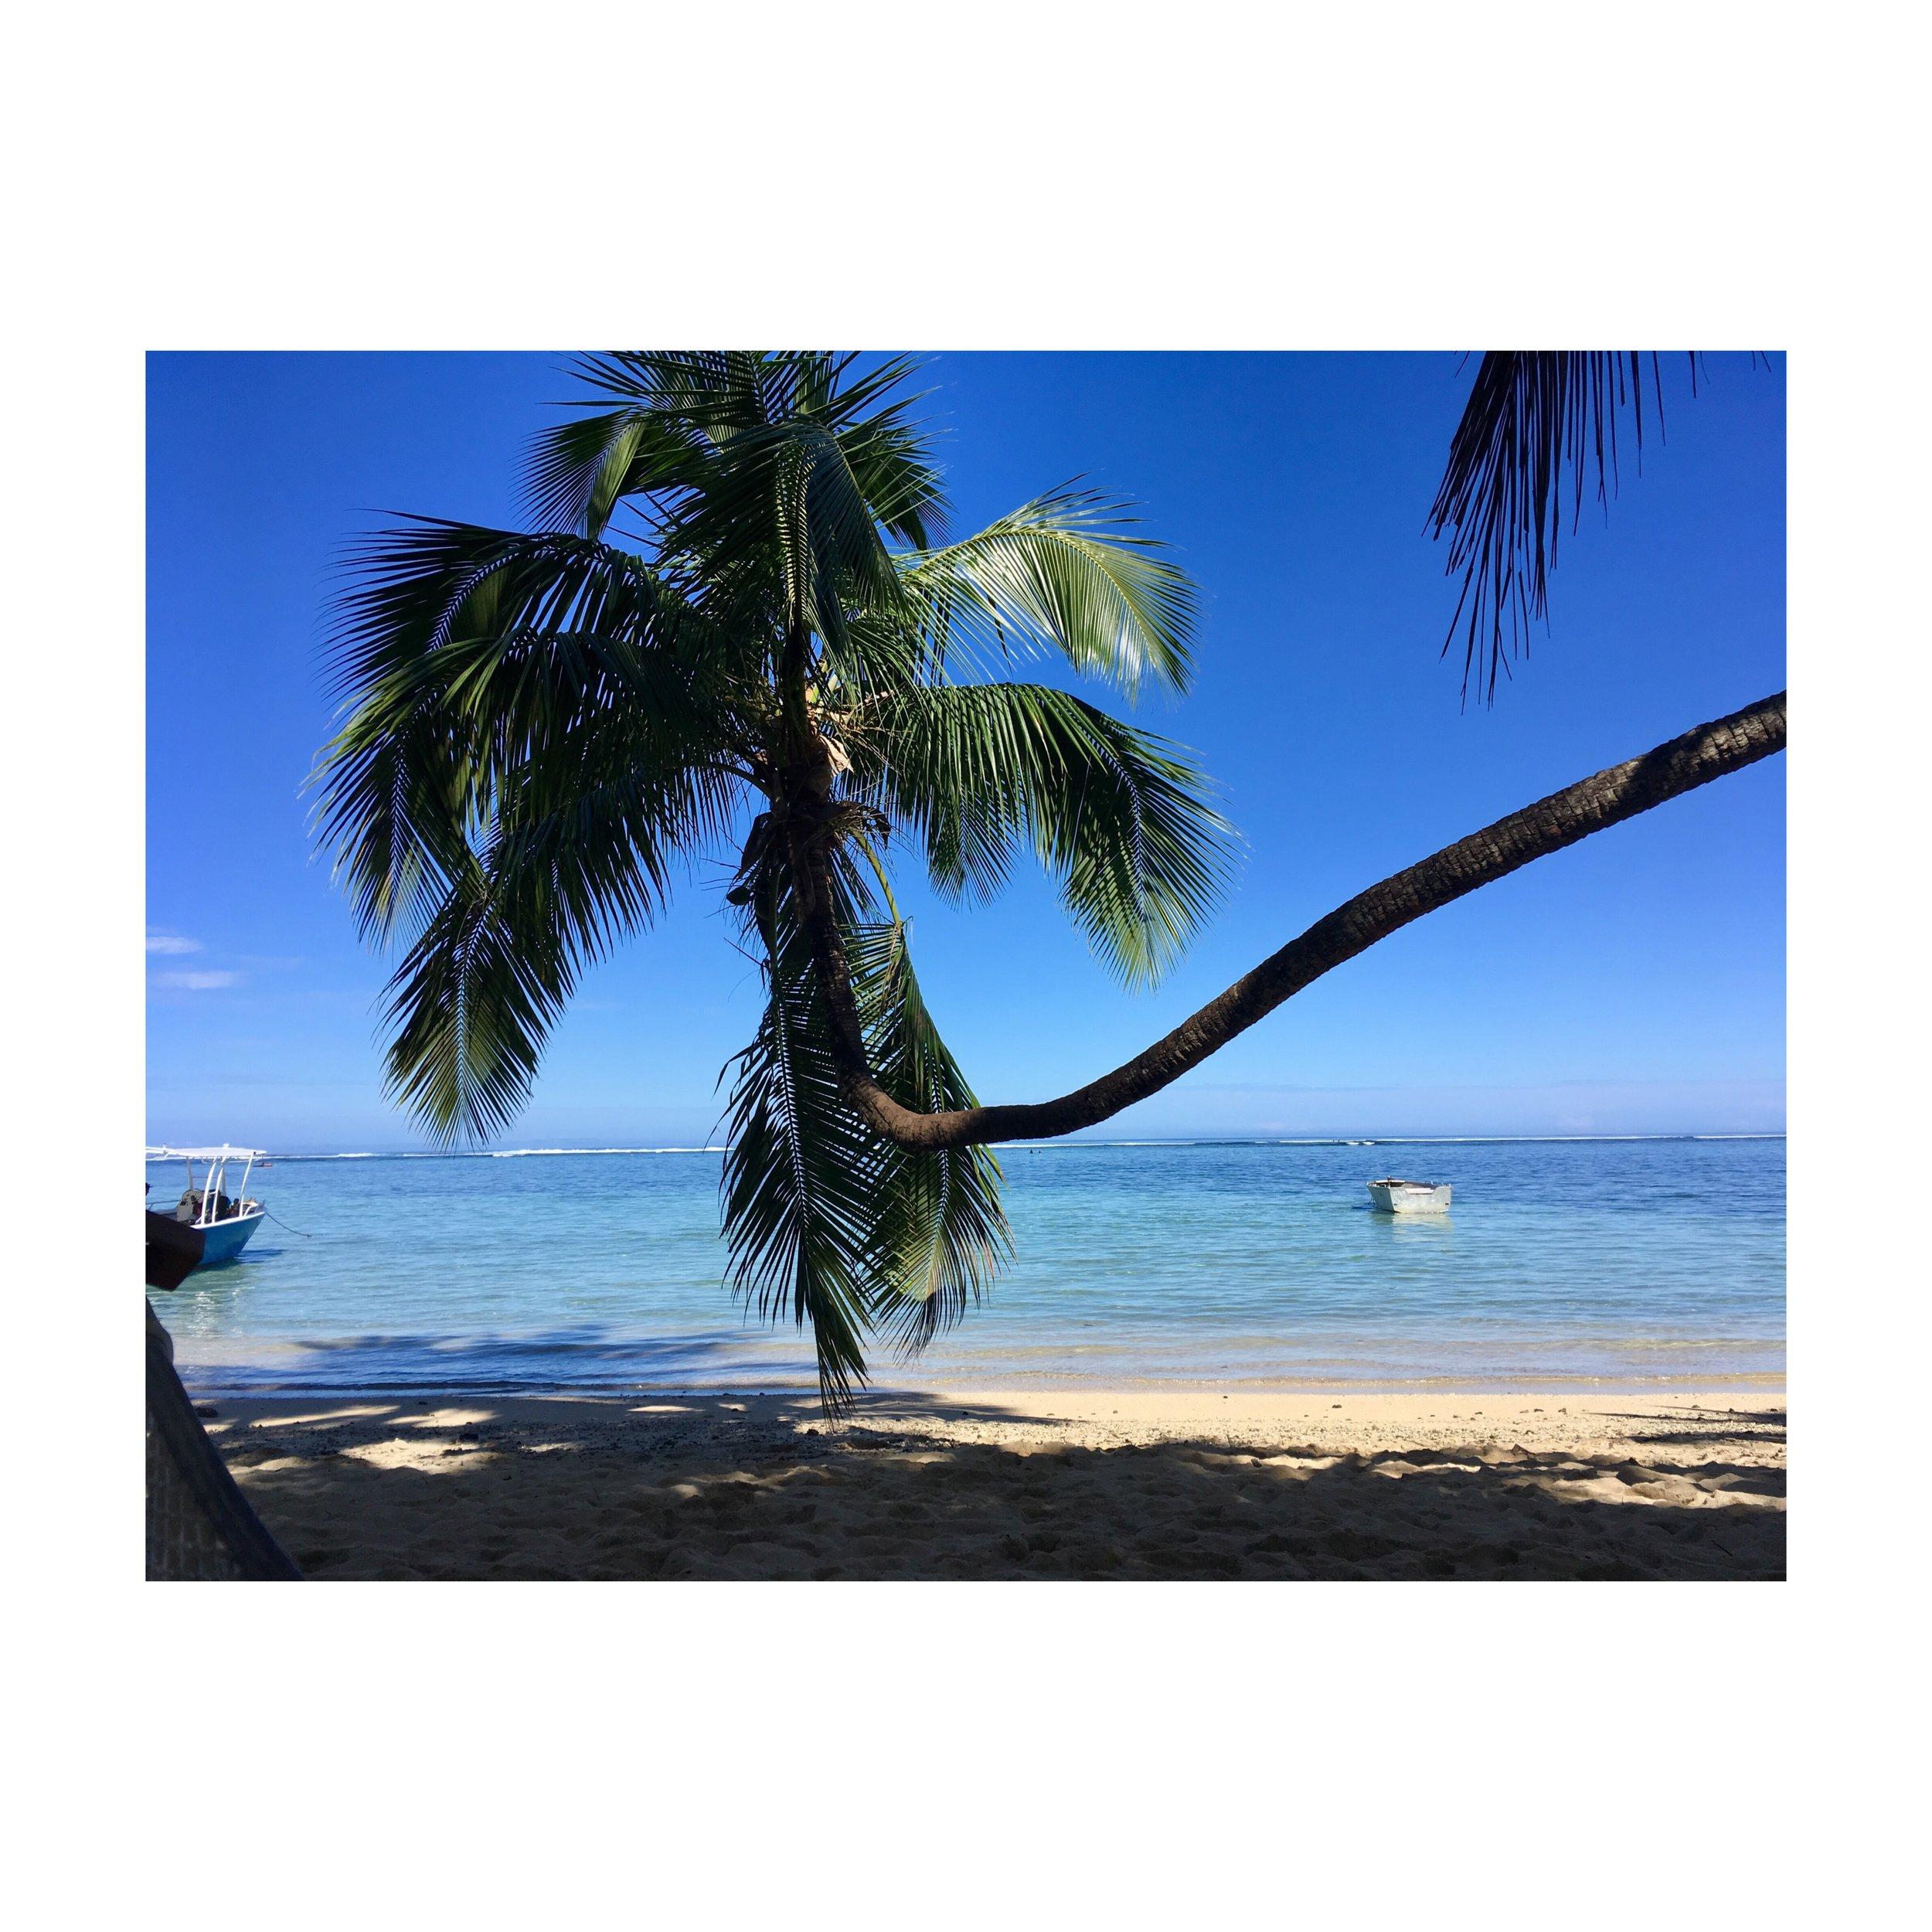 Petit séjour au paradis - Fiji - 2018